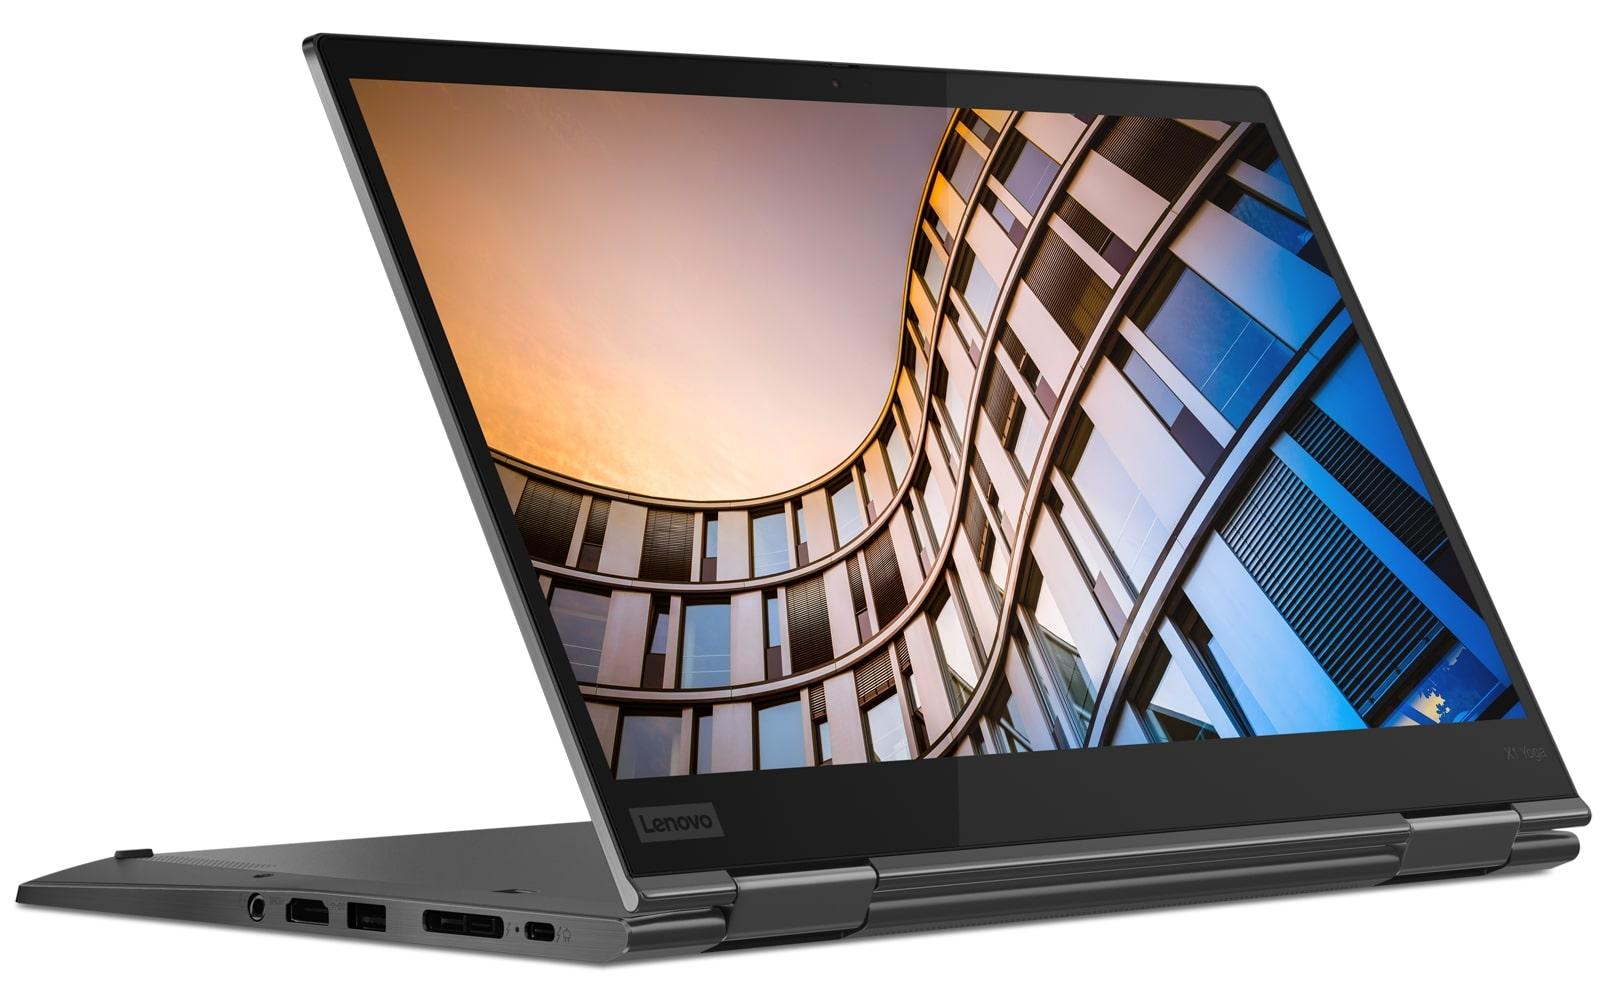 TP X1 Yoga 4 14UHD/i7-8565U/16G/1TSSD/LTE/W10P